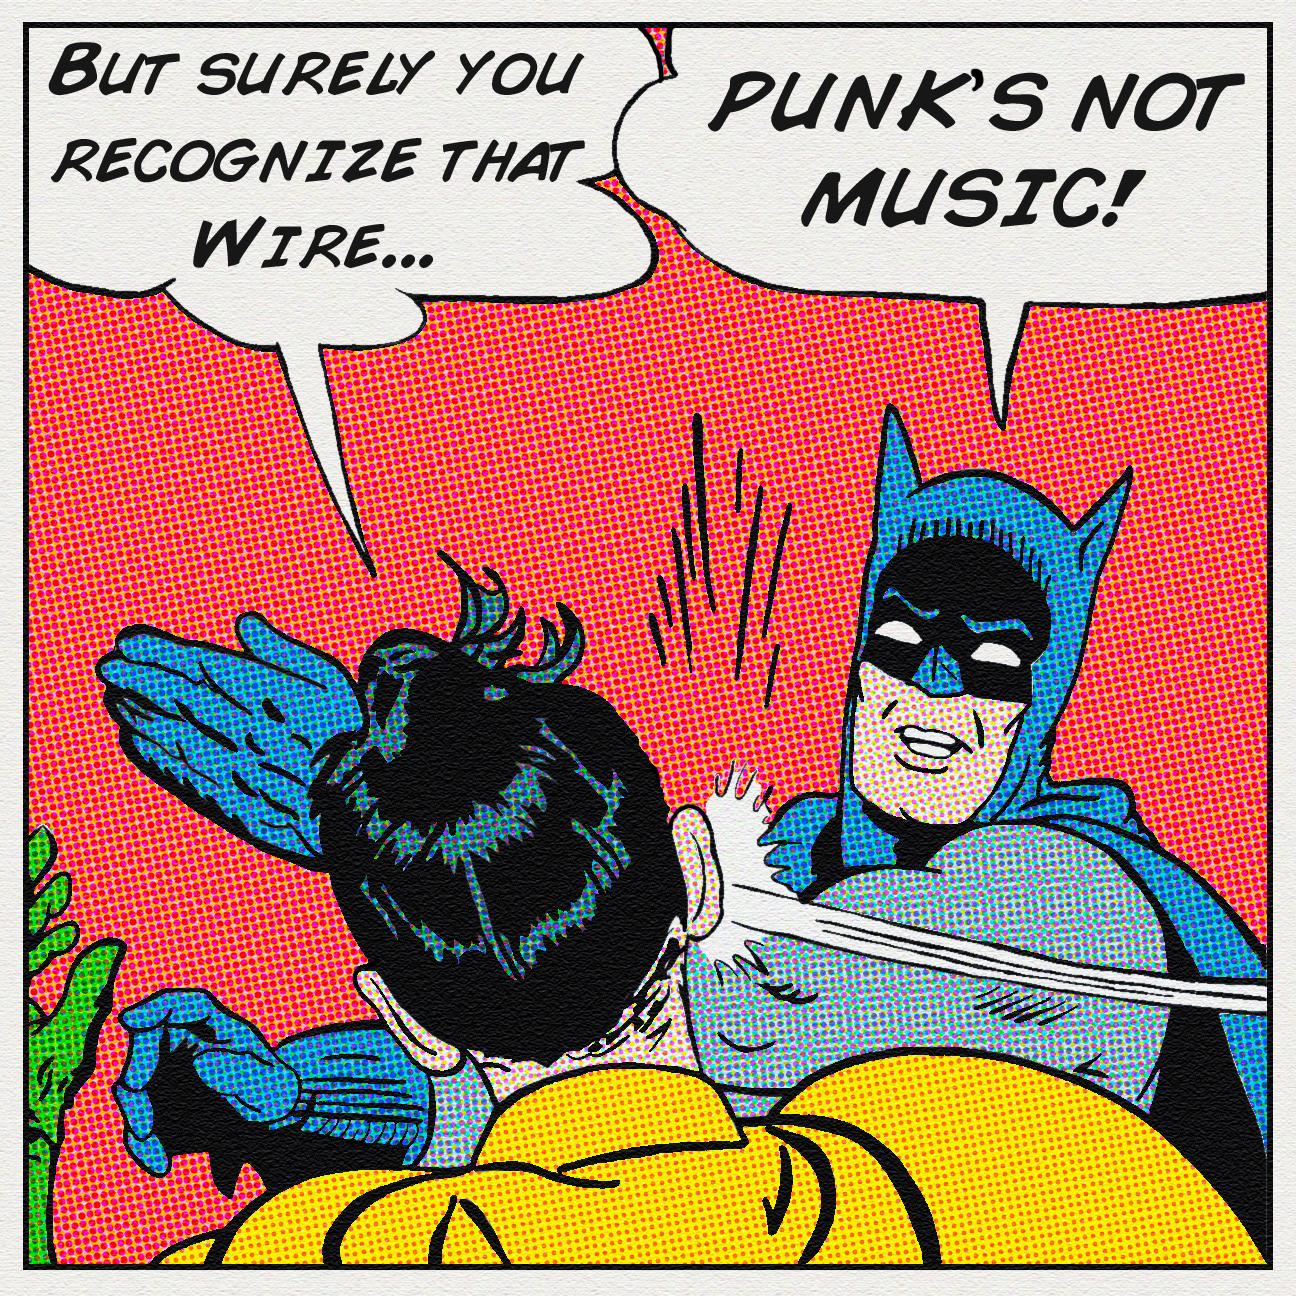 Batman meme punk s not music